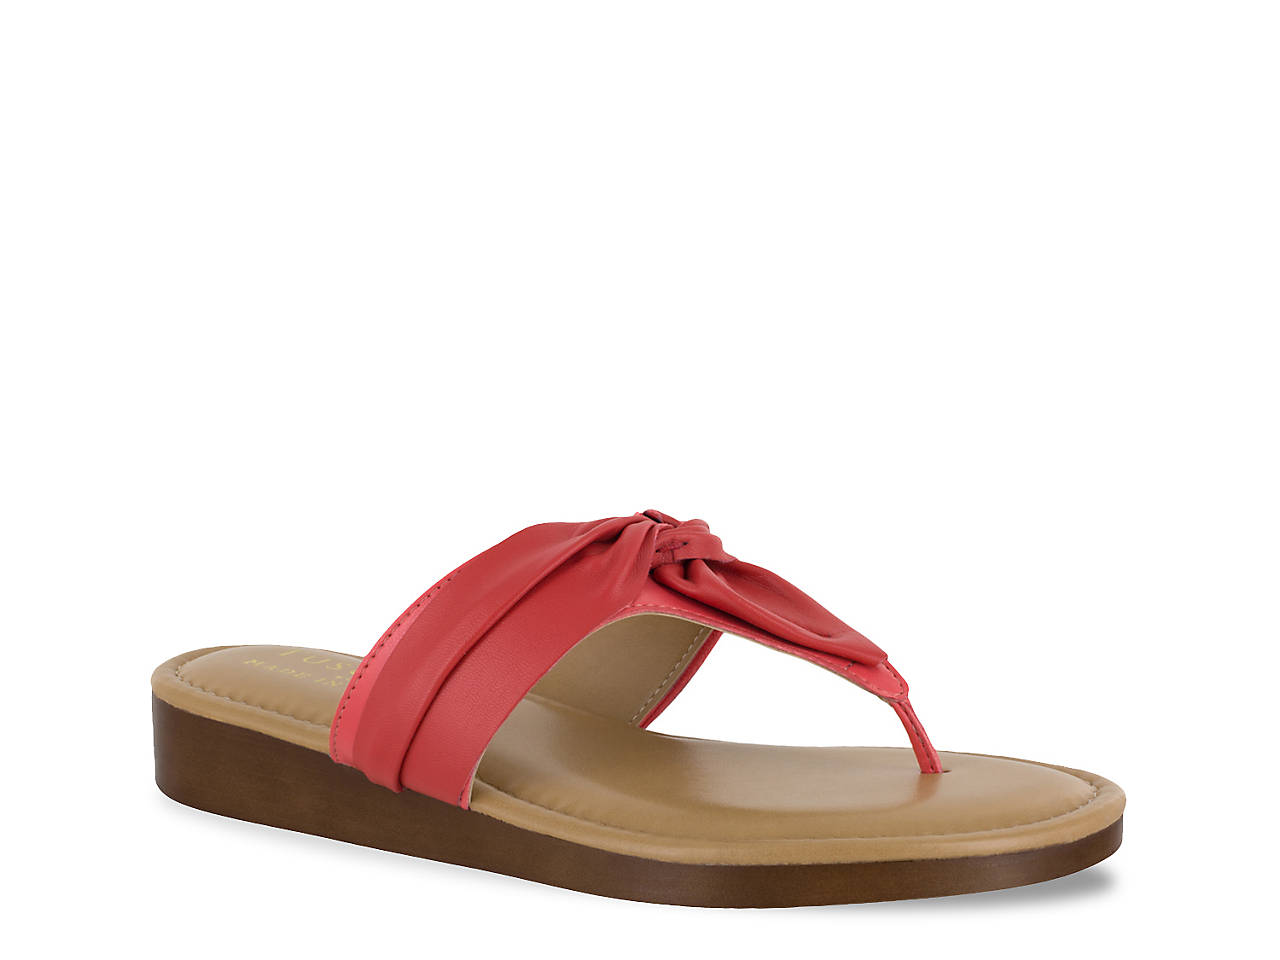 dca01fa7d Easy Street Tuscany Maren Wedge Sandal Women s Shoes